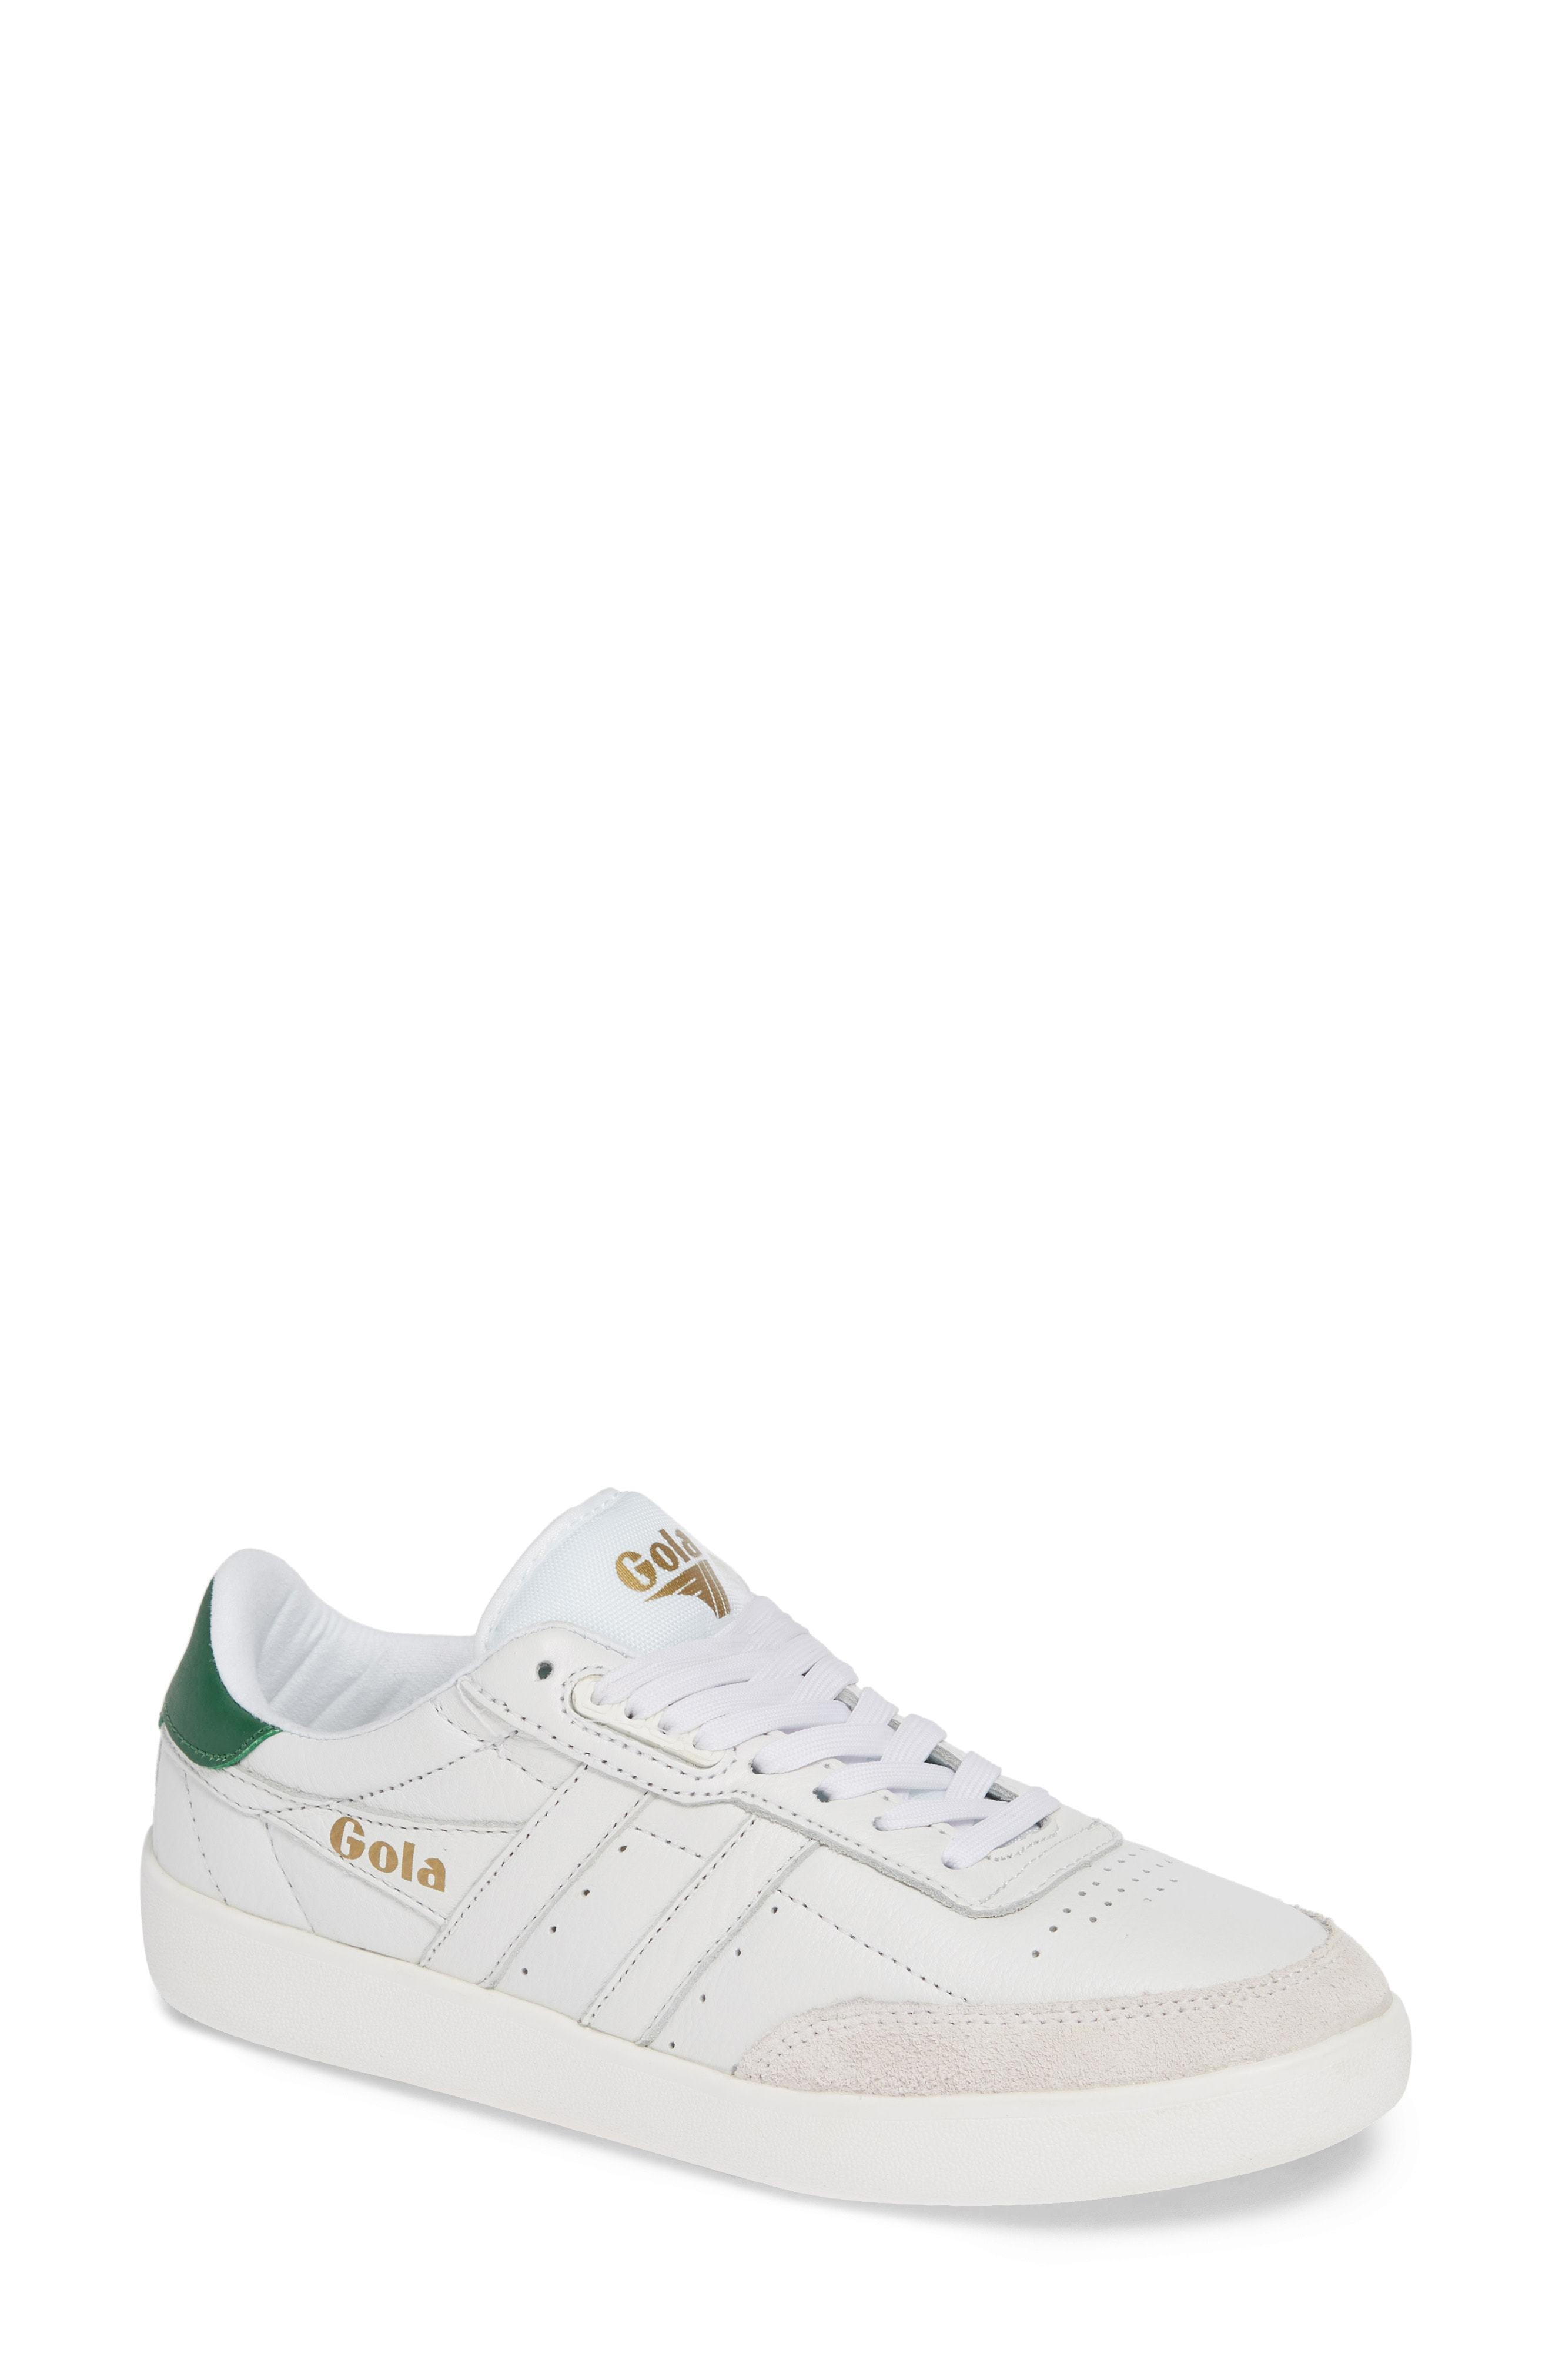 Gola Inca Leather Sneaker